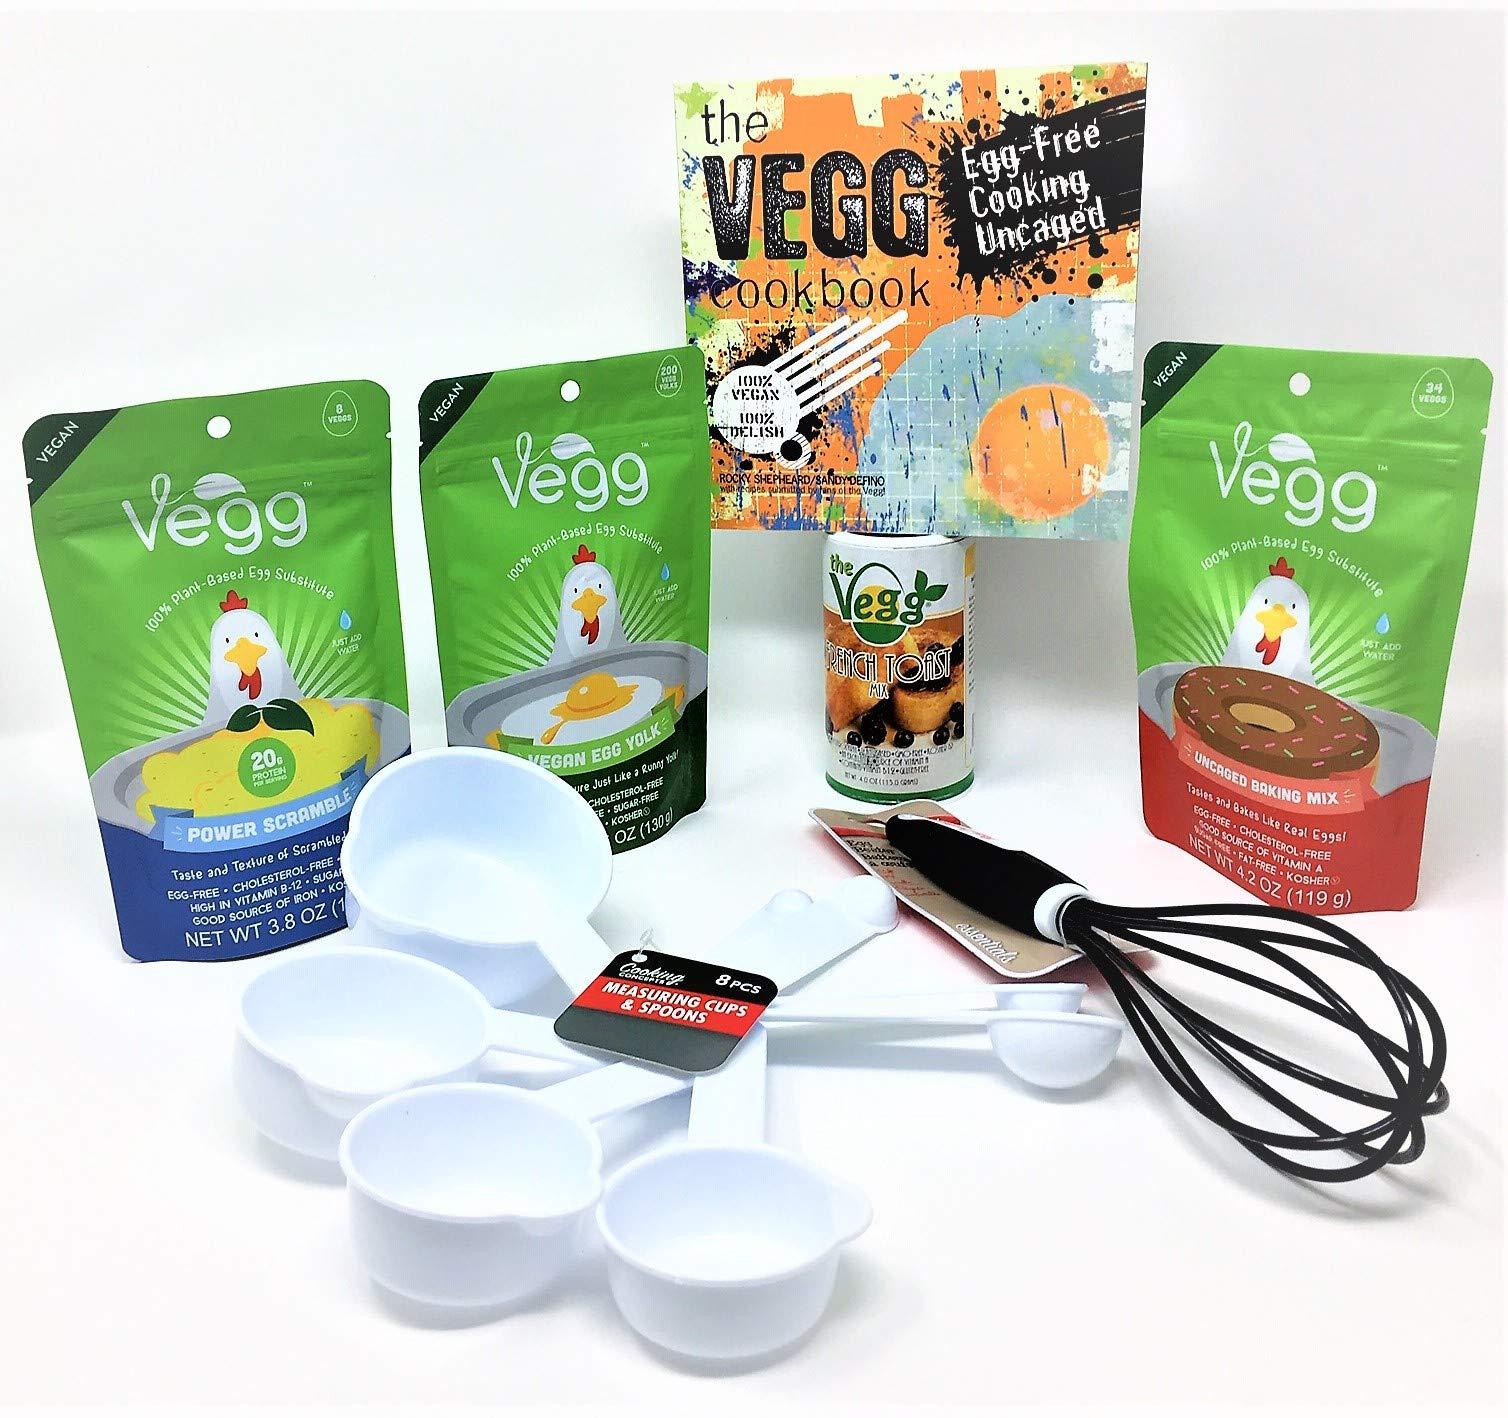 The Vegg Vegan Mega Pack Vegan Egg Yolk + Power Scramble + French Toast Mix + Uncaged Baking Mix + Egg Wisk + Measuring Cups and Spoons + The Vegg Cookbook